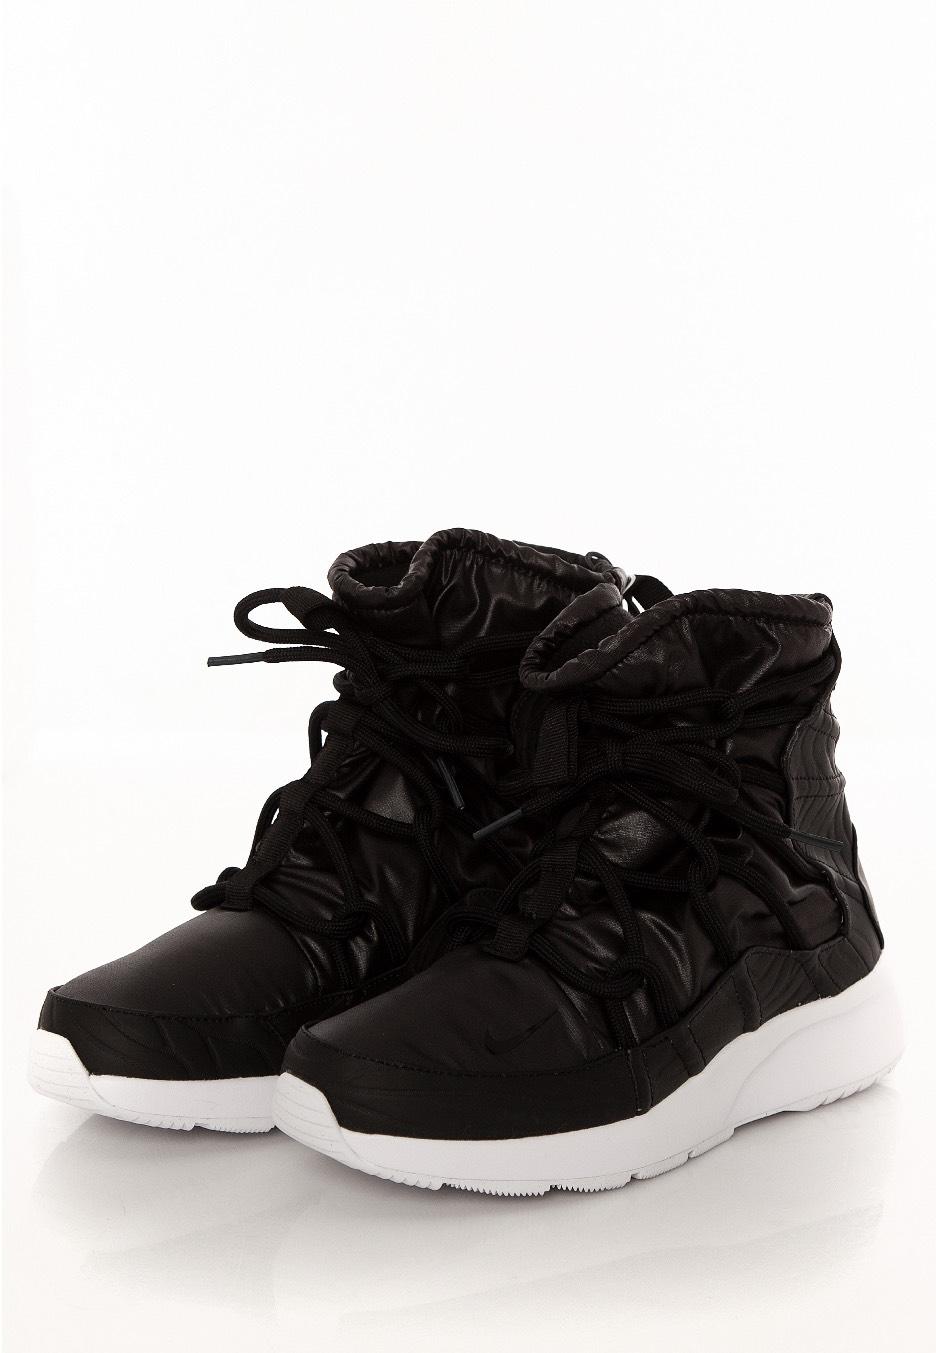 Girl Nike Tanjun Shoes Blackblackanthracitewhite High Rise 8n0mwOyvN